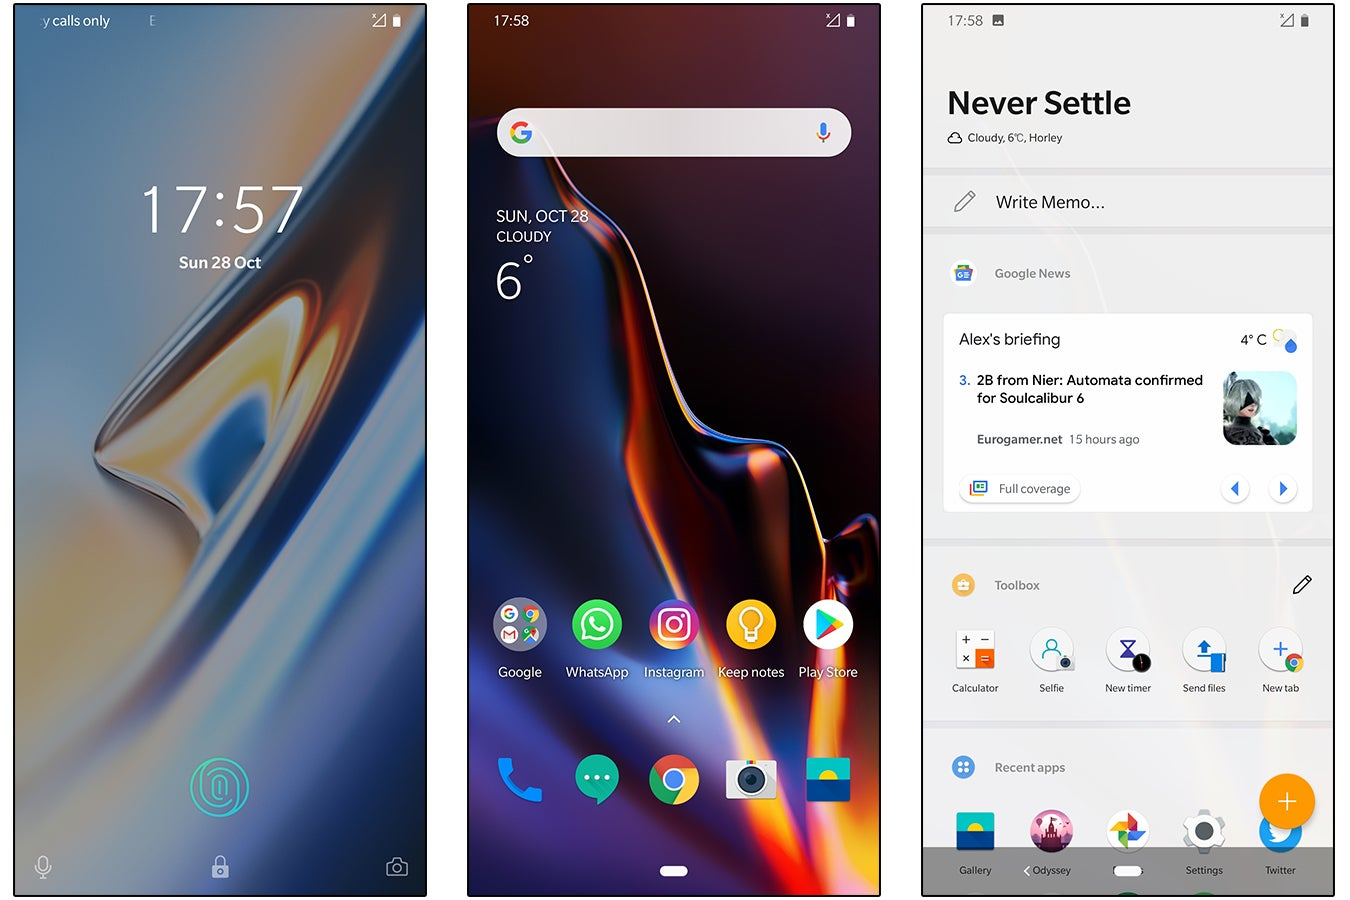 OnePlus 6T OxygenOS screenshots 1, 2, 3